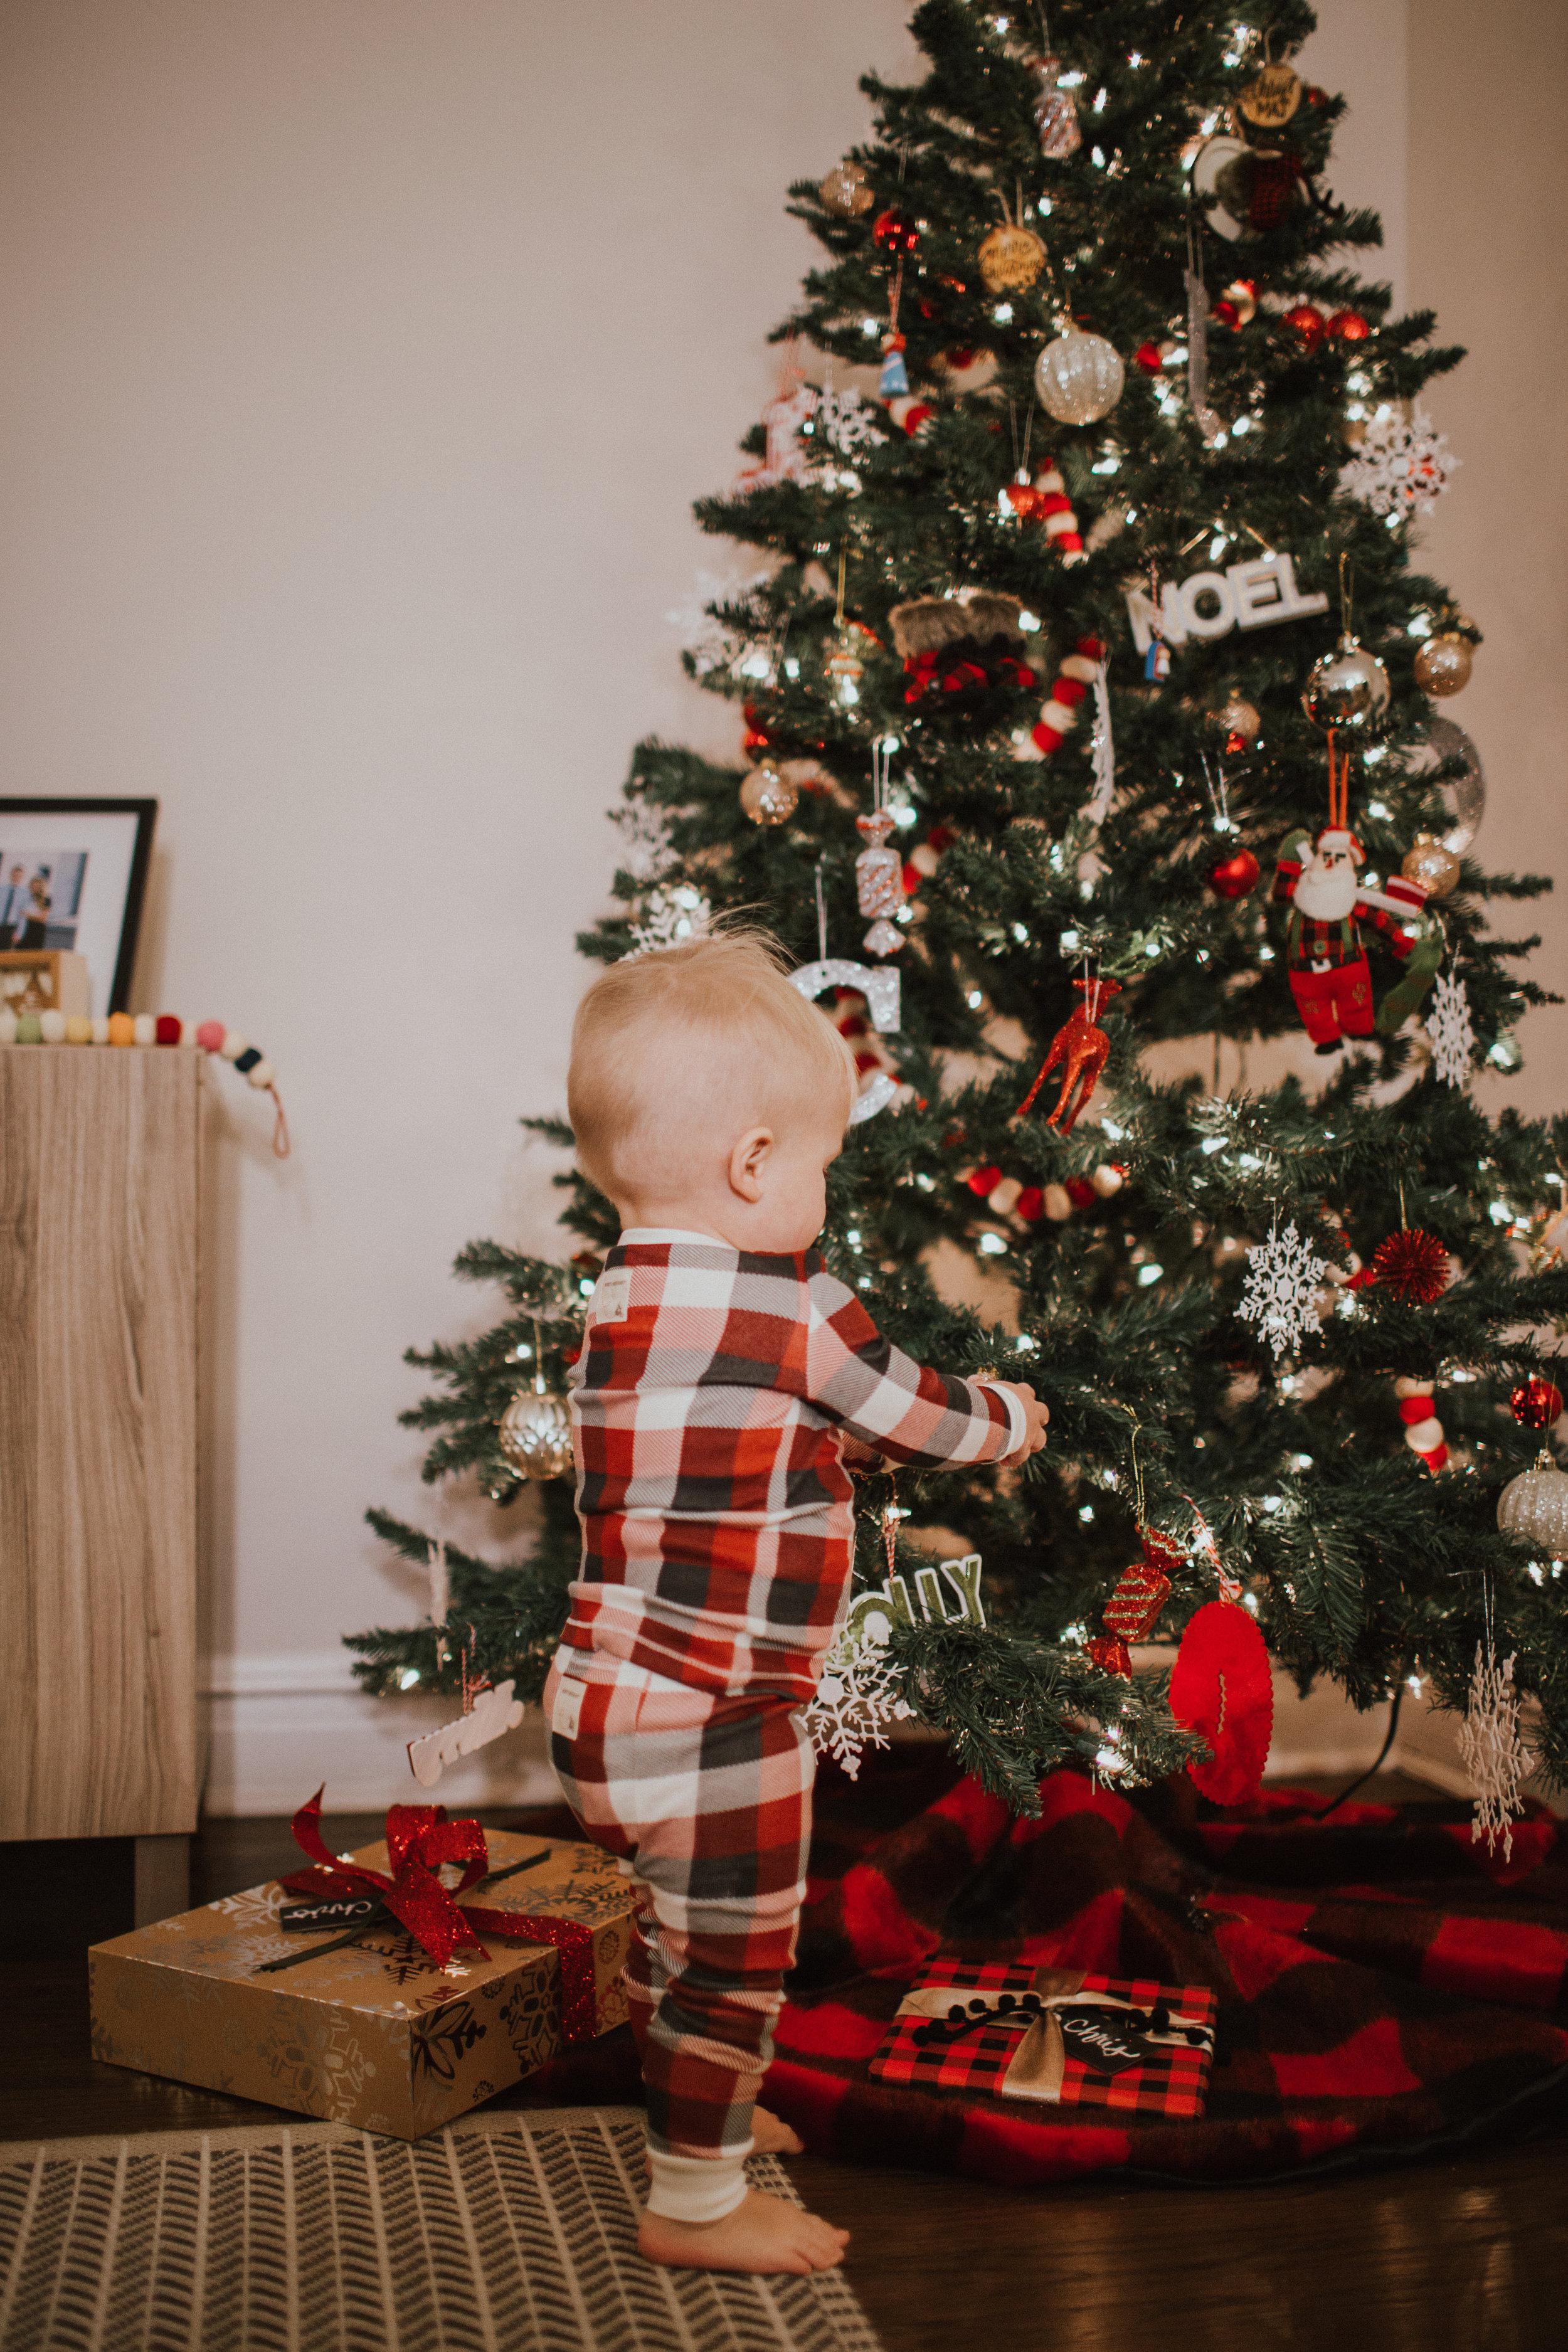 Christmas2017-4.jpg